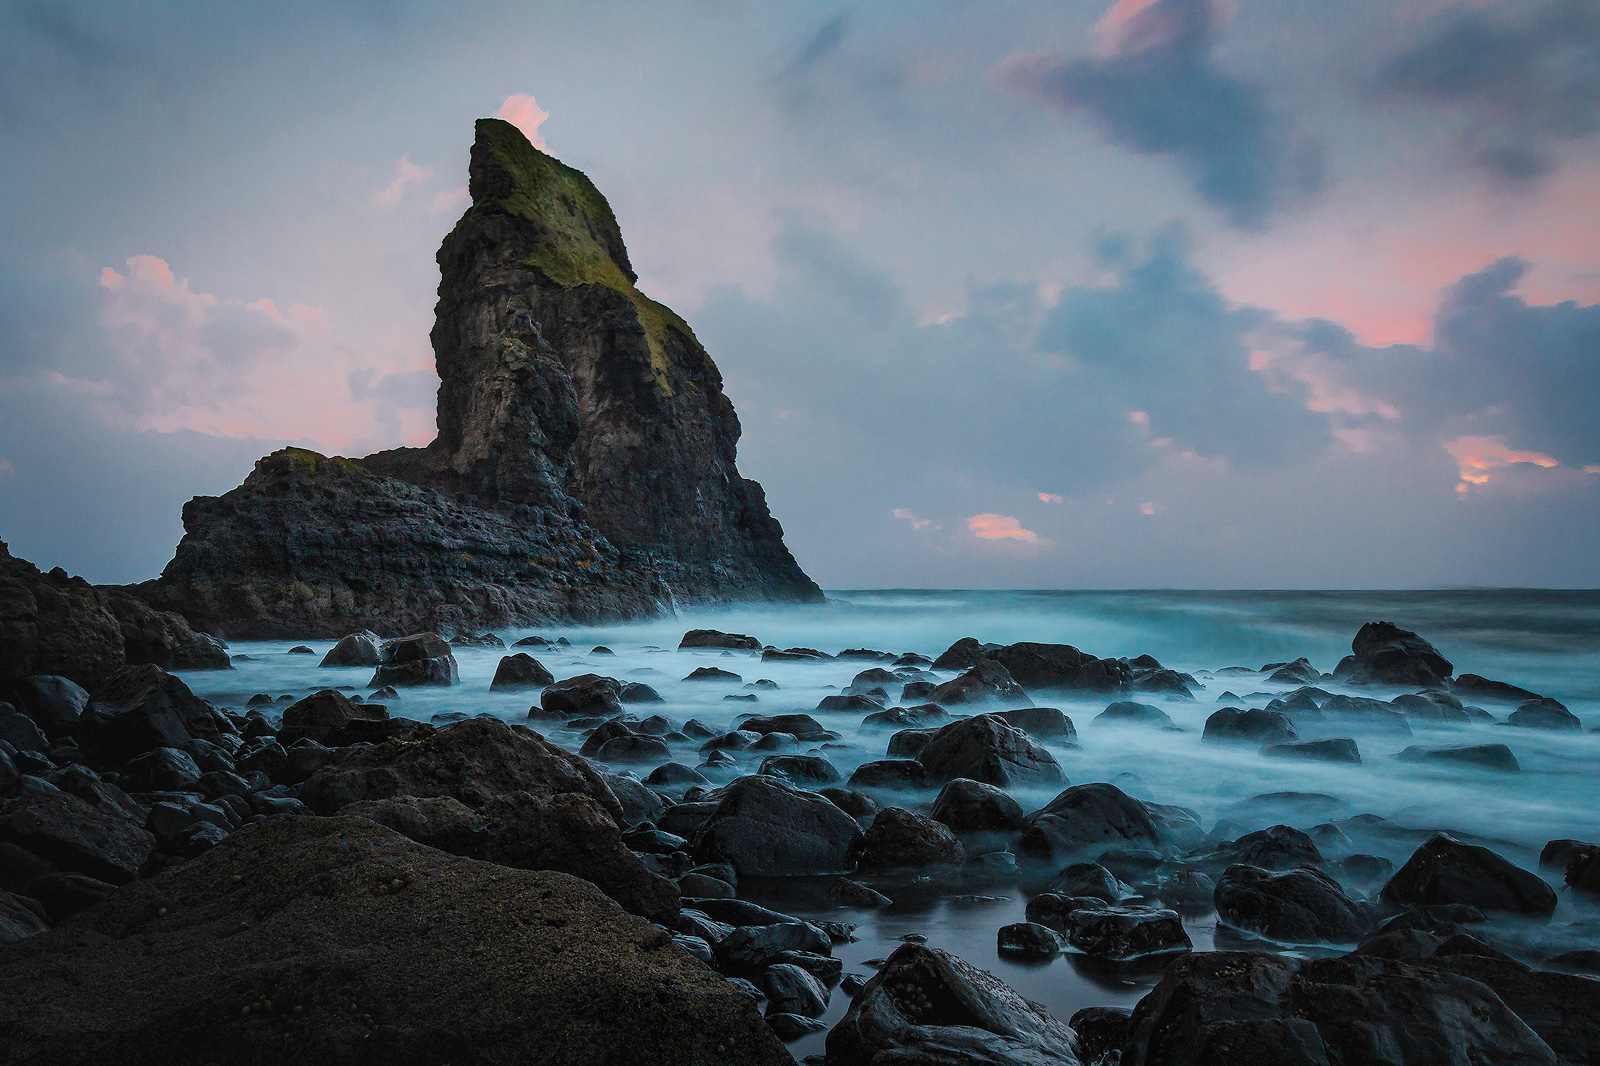 Talisker Bay, Reisebericht Isle of Skye, Schottland, Jaworskyj, Lukas Voegelin, abenteuerfotoreisen, kathrinsworld, Kathrin's World